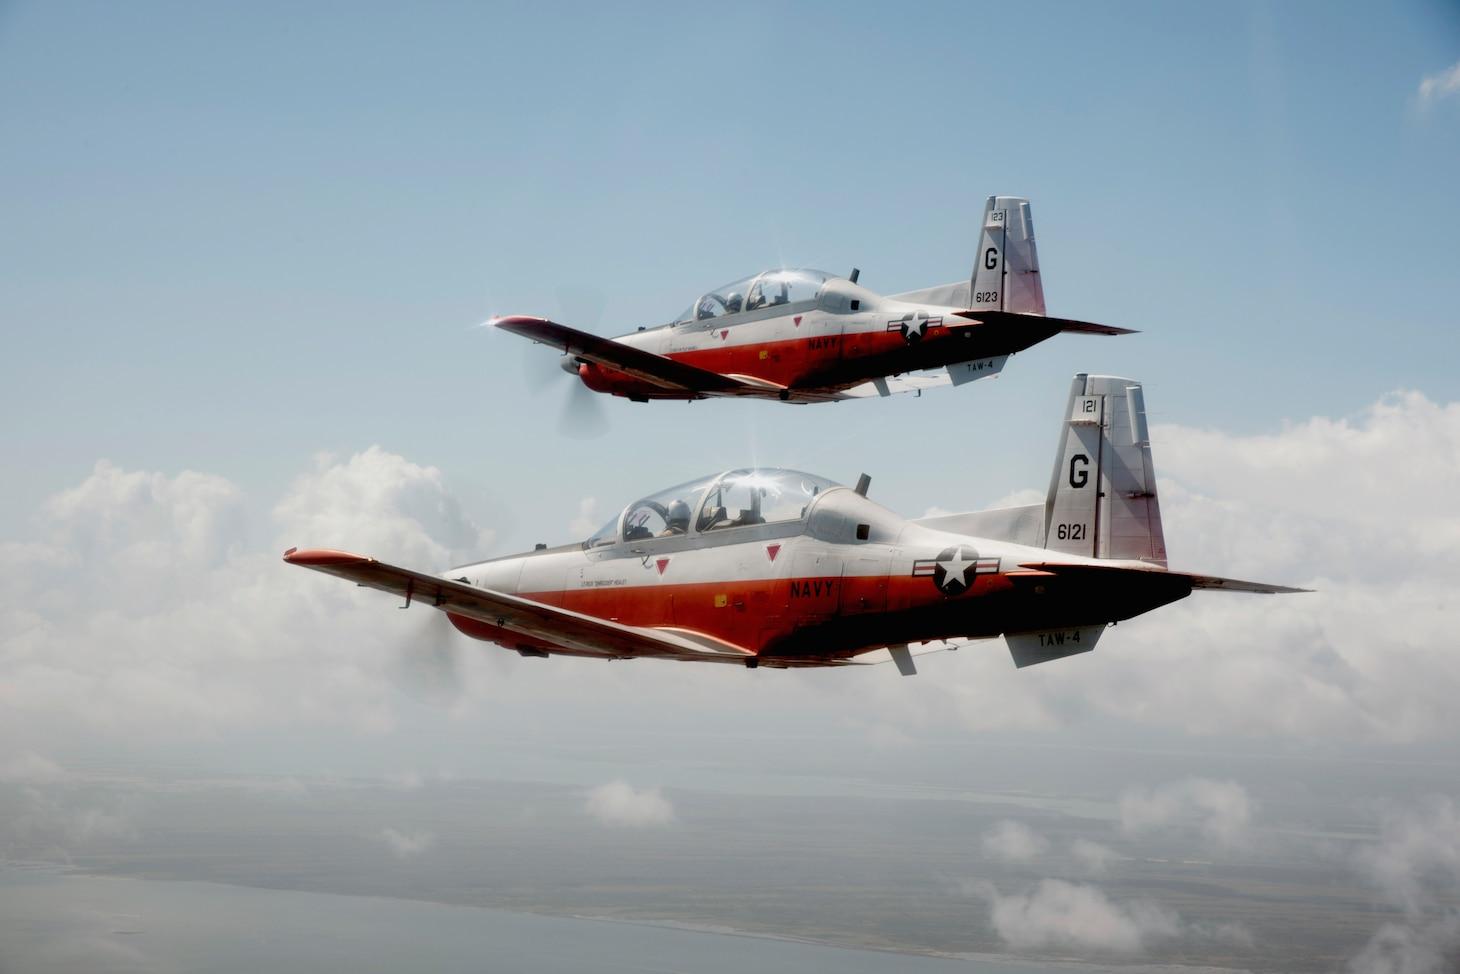 Student naval aviators conduct a formation flight in T-6B Texan II aircraft.